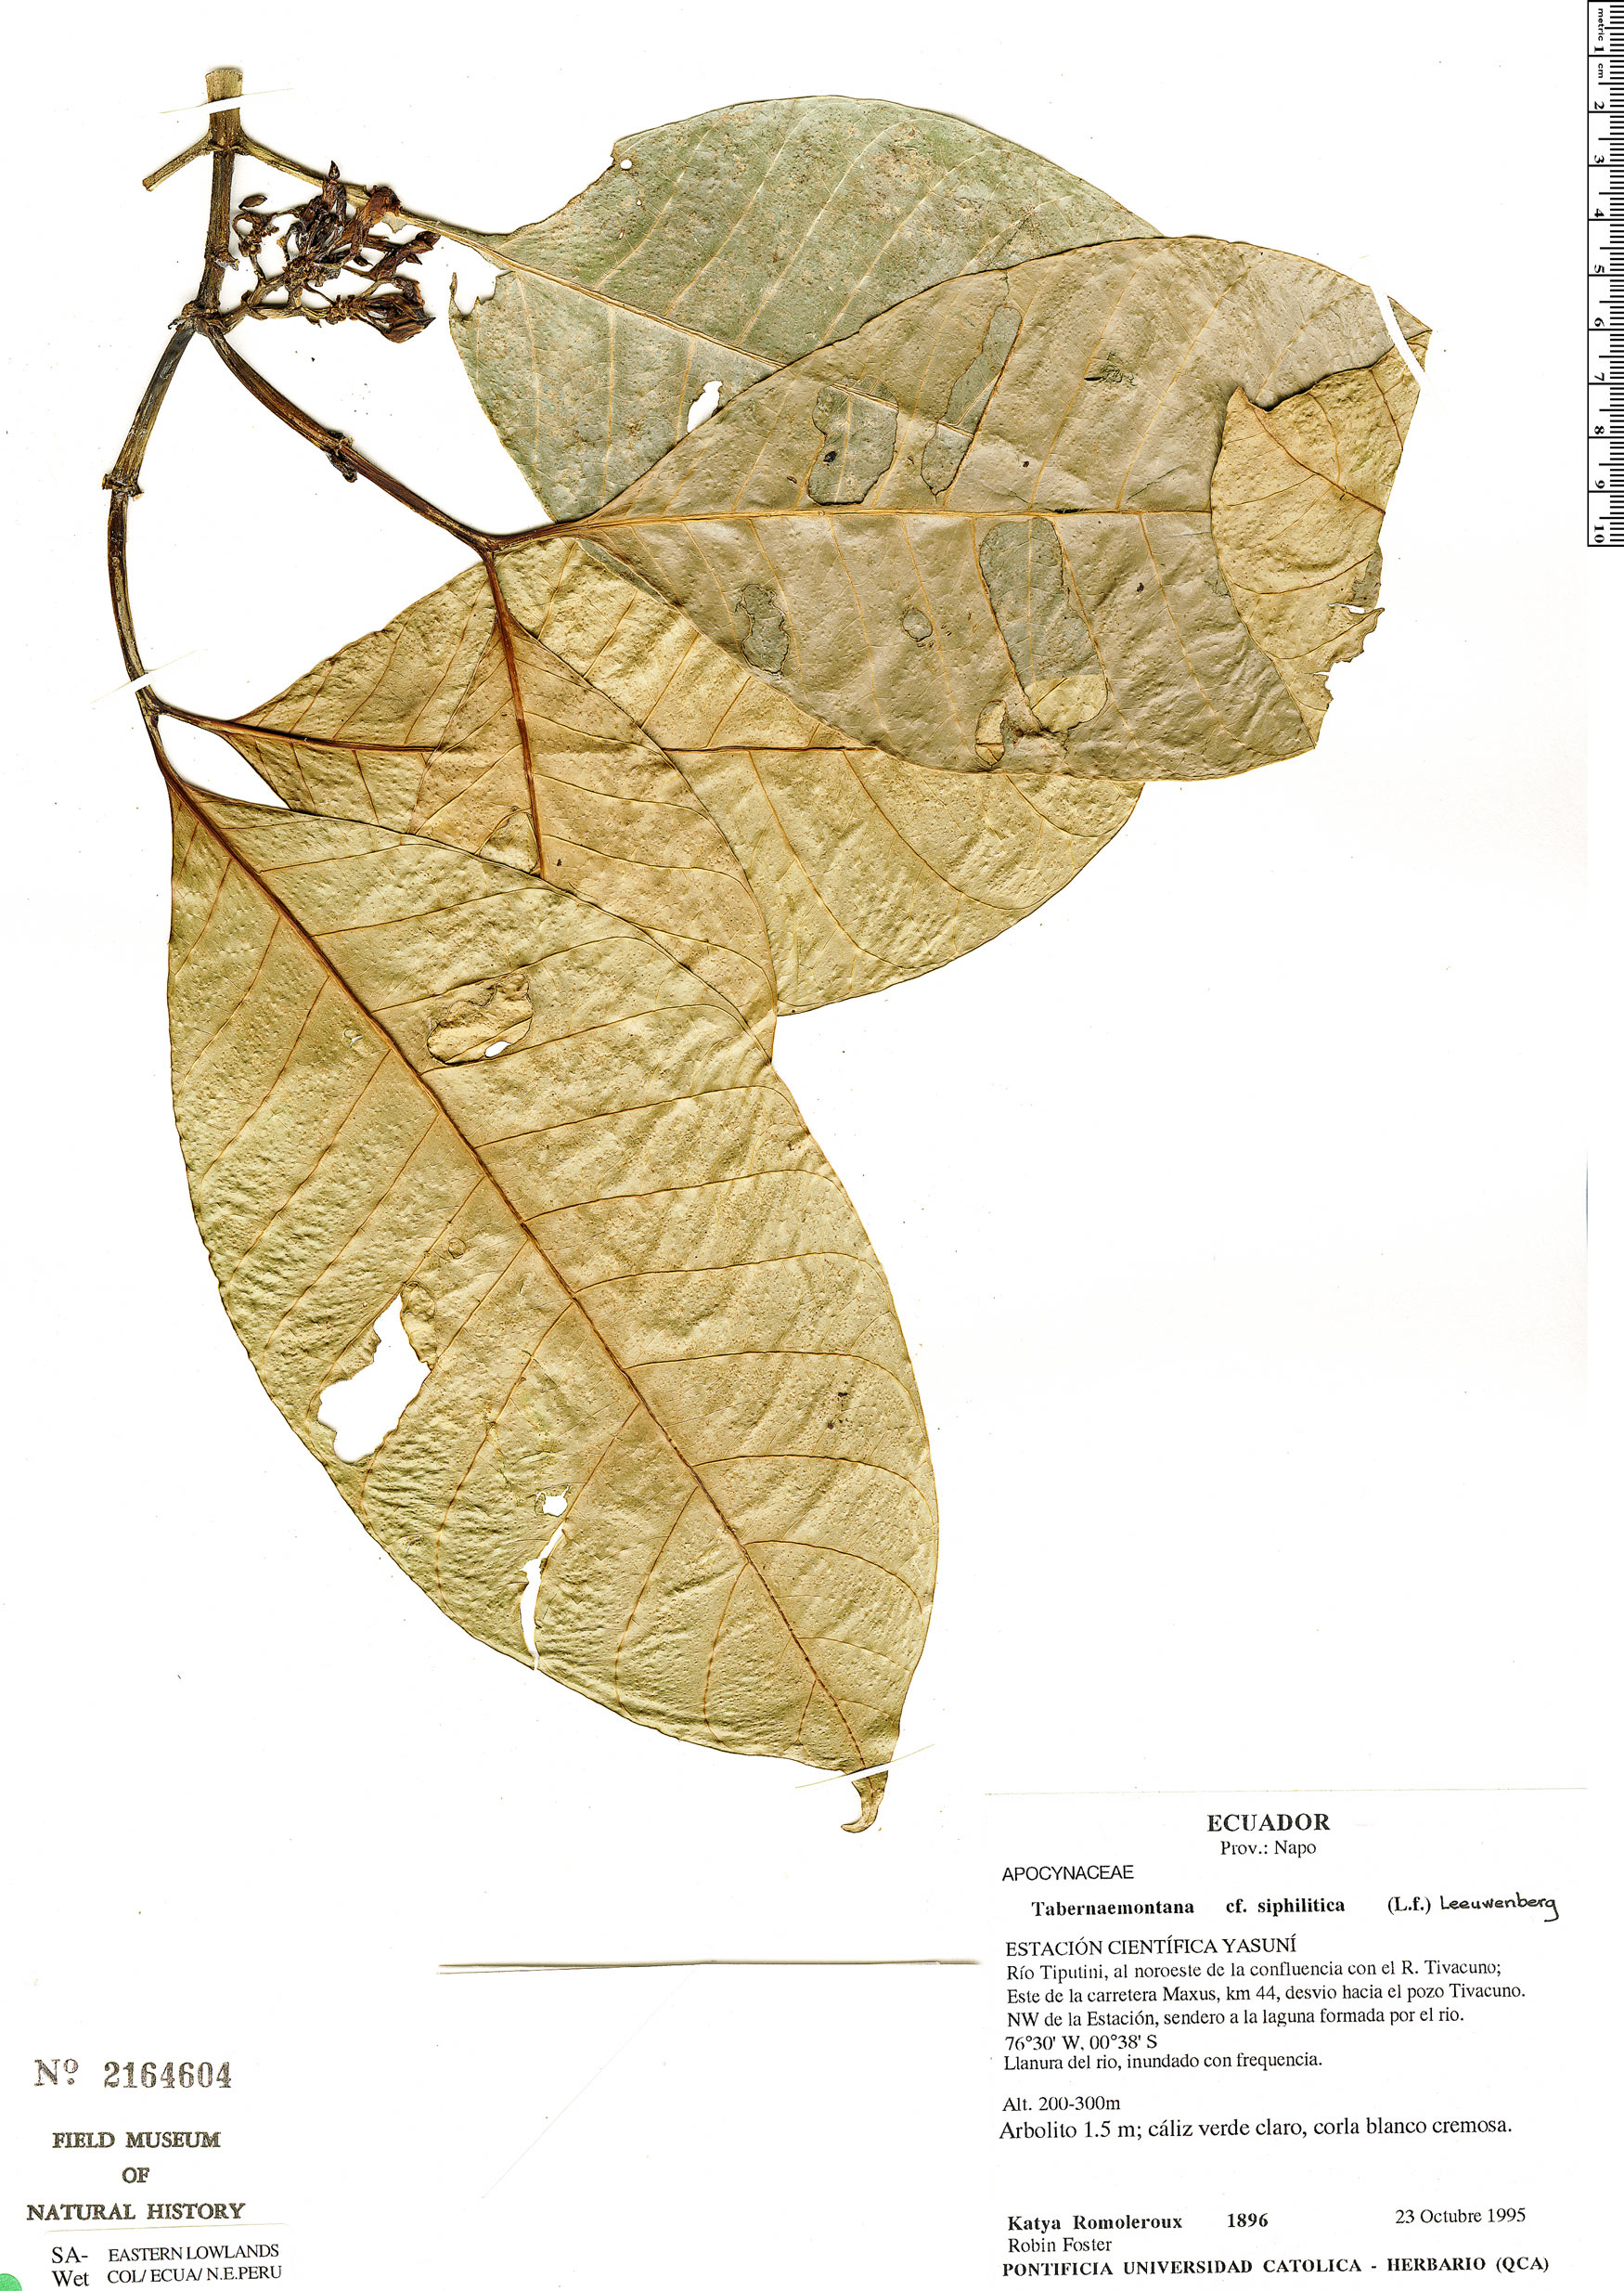 Espécime: Tabernaemontana siphilitica